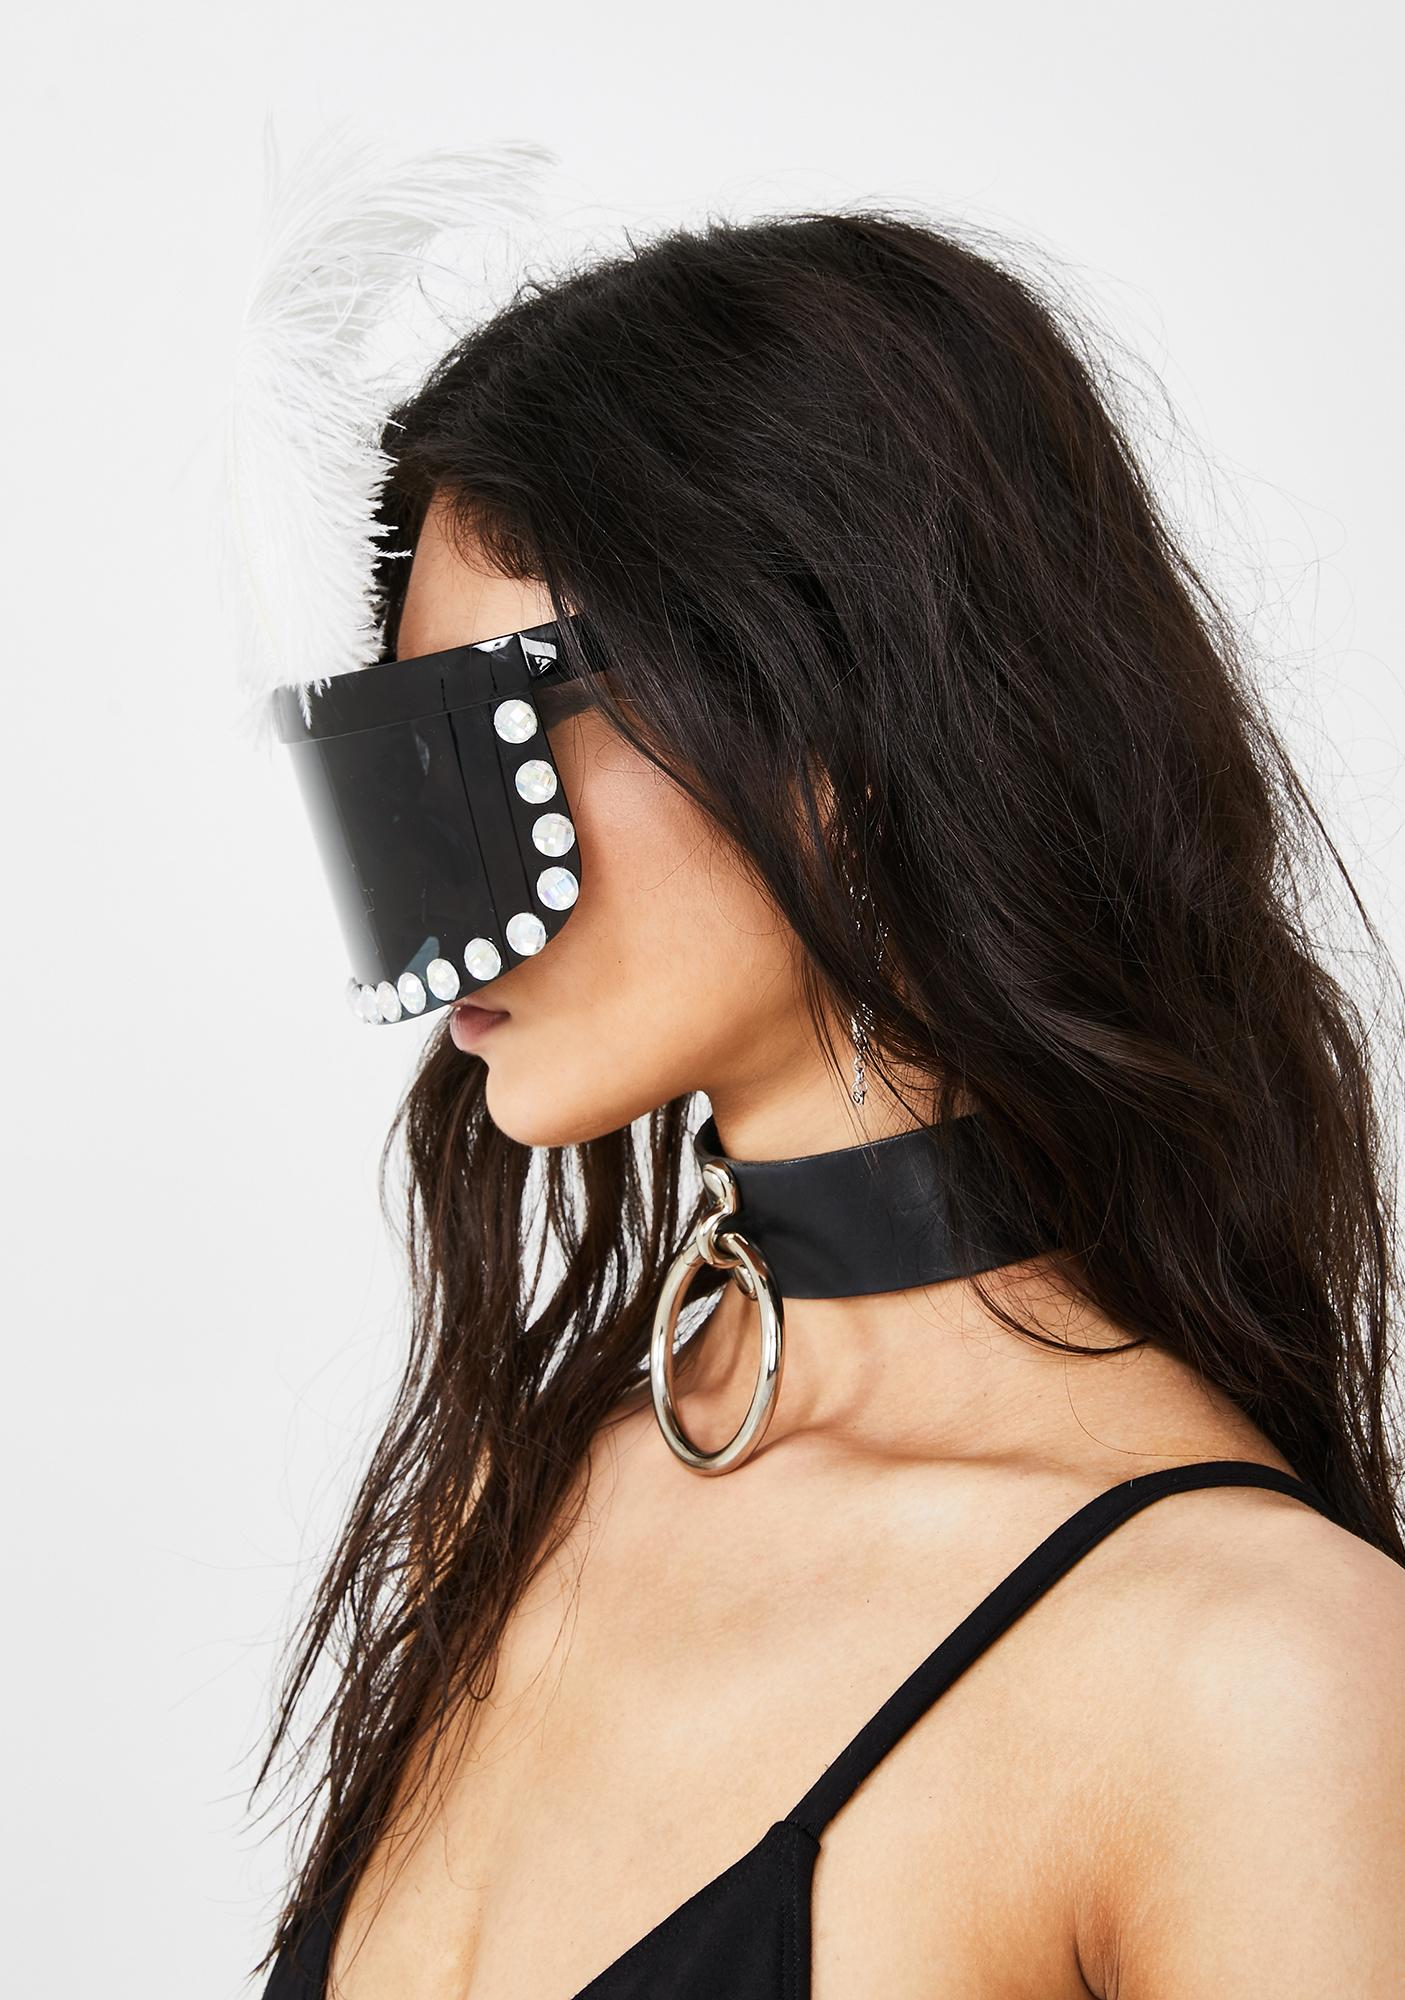 Surreal Cyborg Face Visor